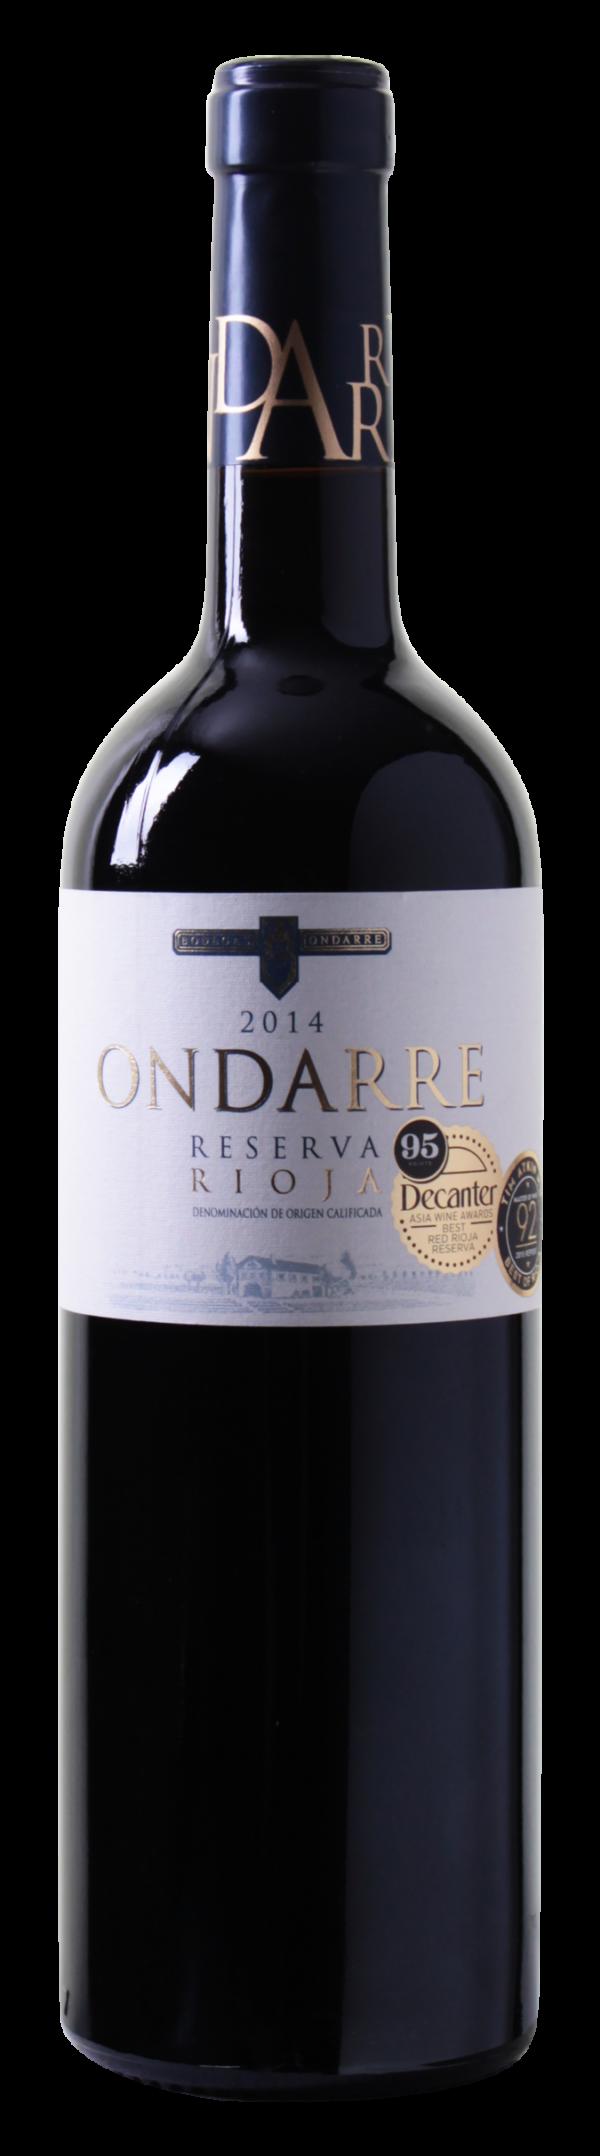 2 x 95 Punkte: Ondarre – Reserva – Rioja DOCa 2014 nur 6,49 € statt 12,99 €